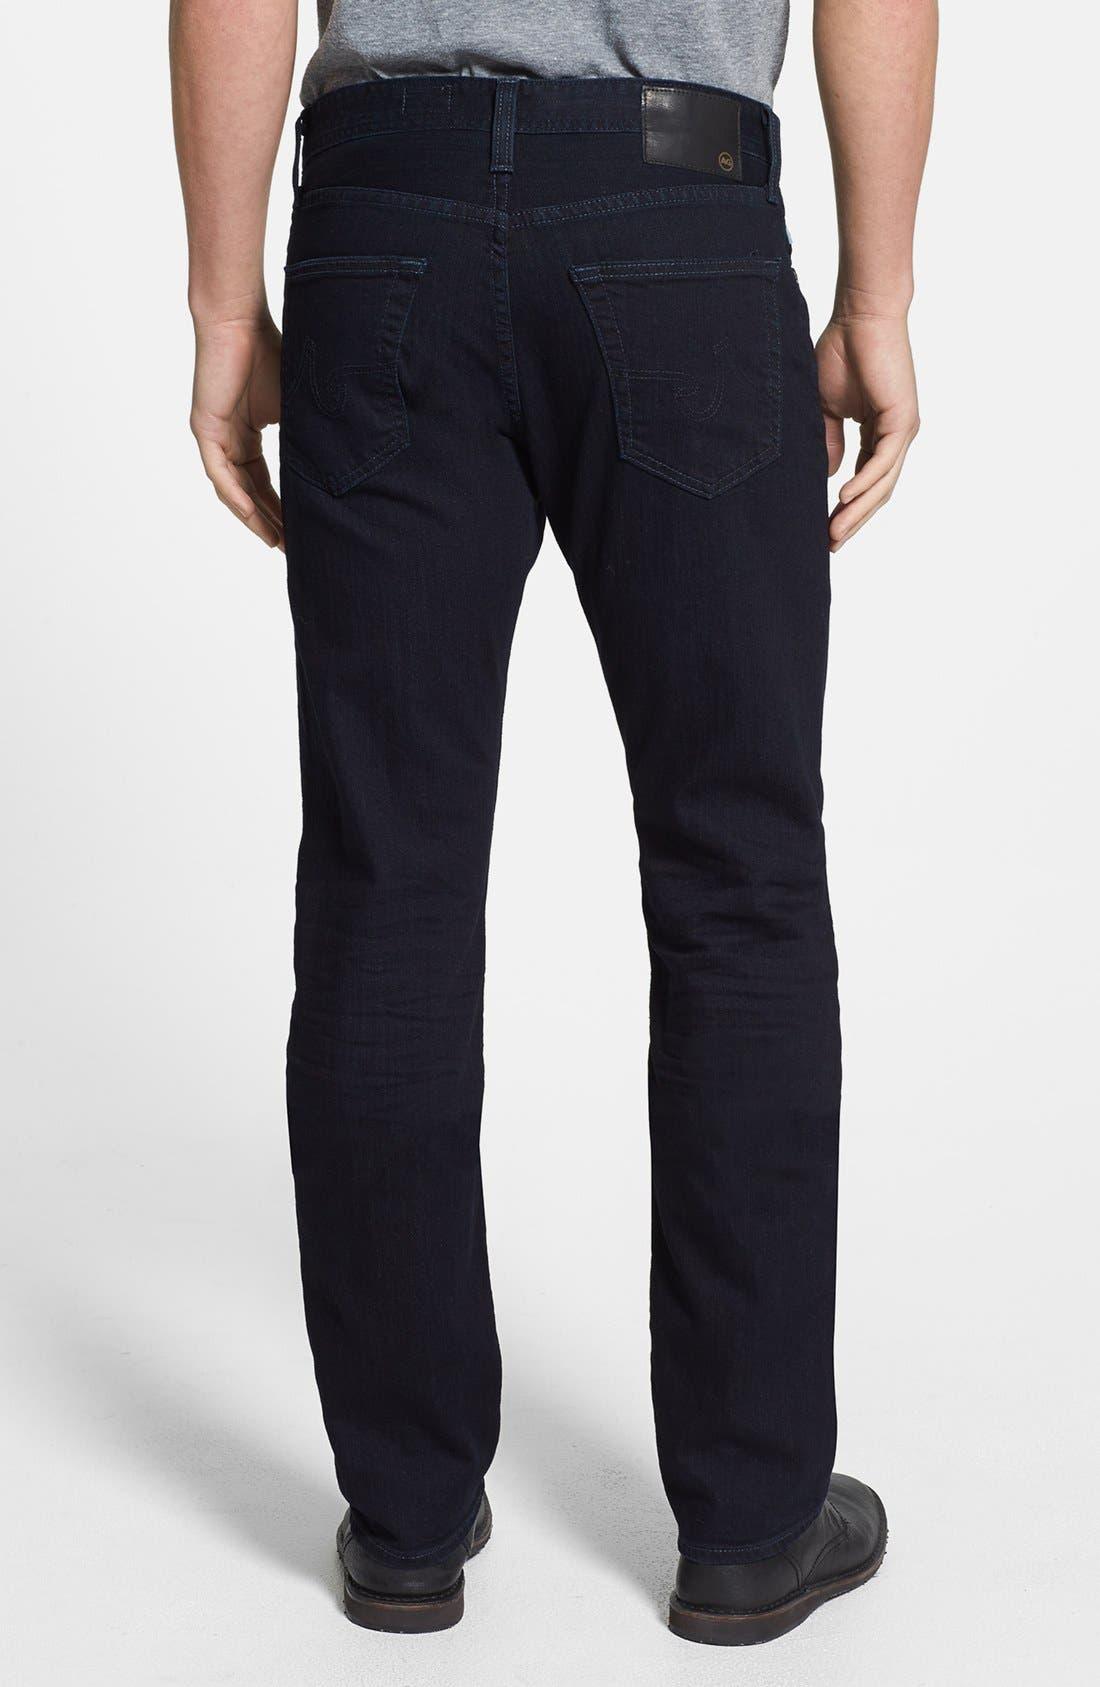 'Graduate' Tailored Fit Straight Leg Jeans,                             Alternate thumbnail 2, color,                             409